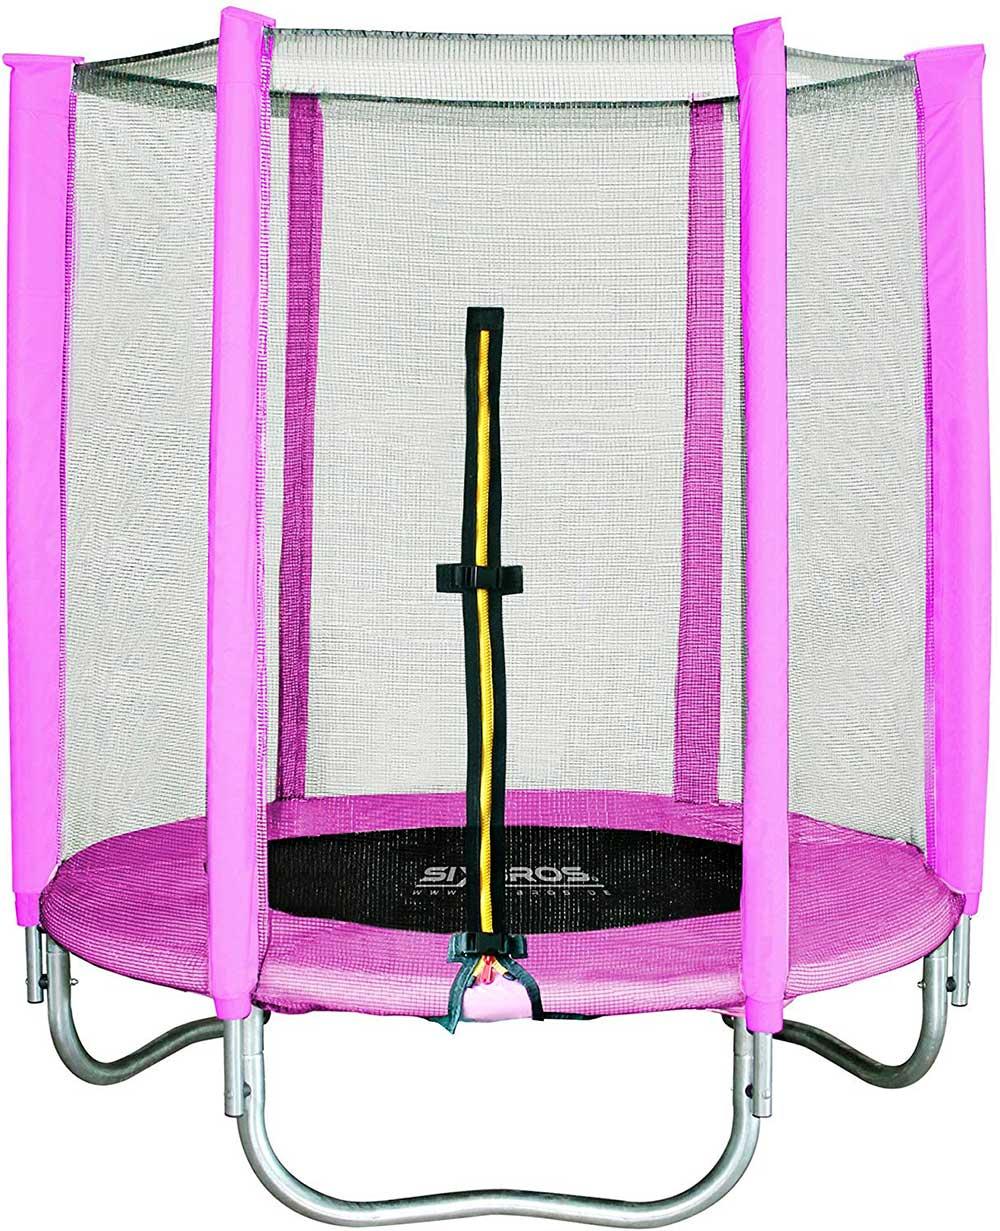 cama-elastica-decathlon-140